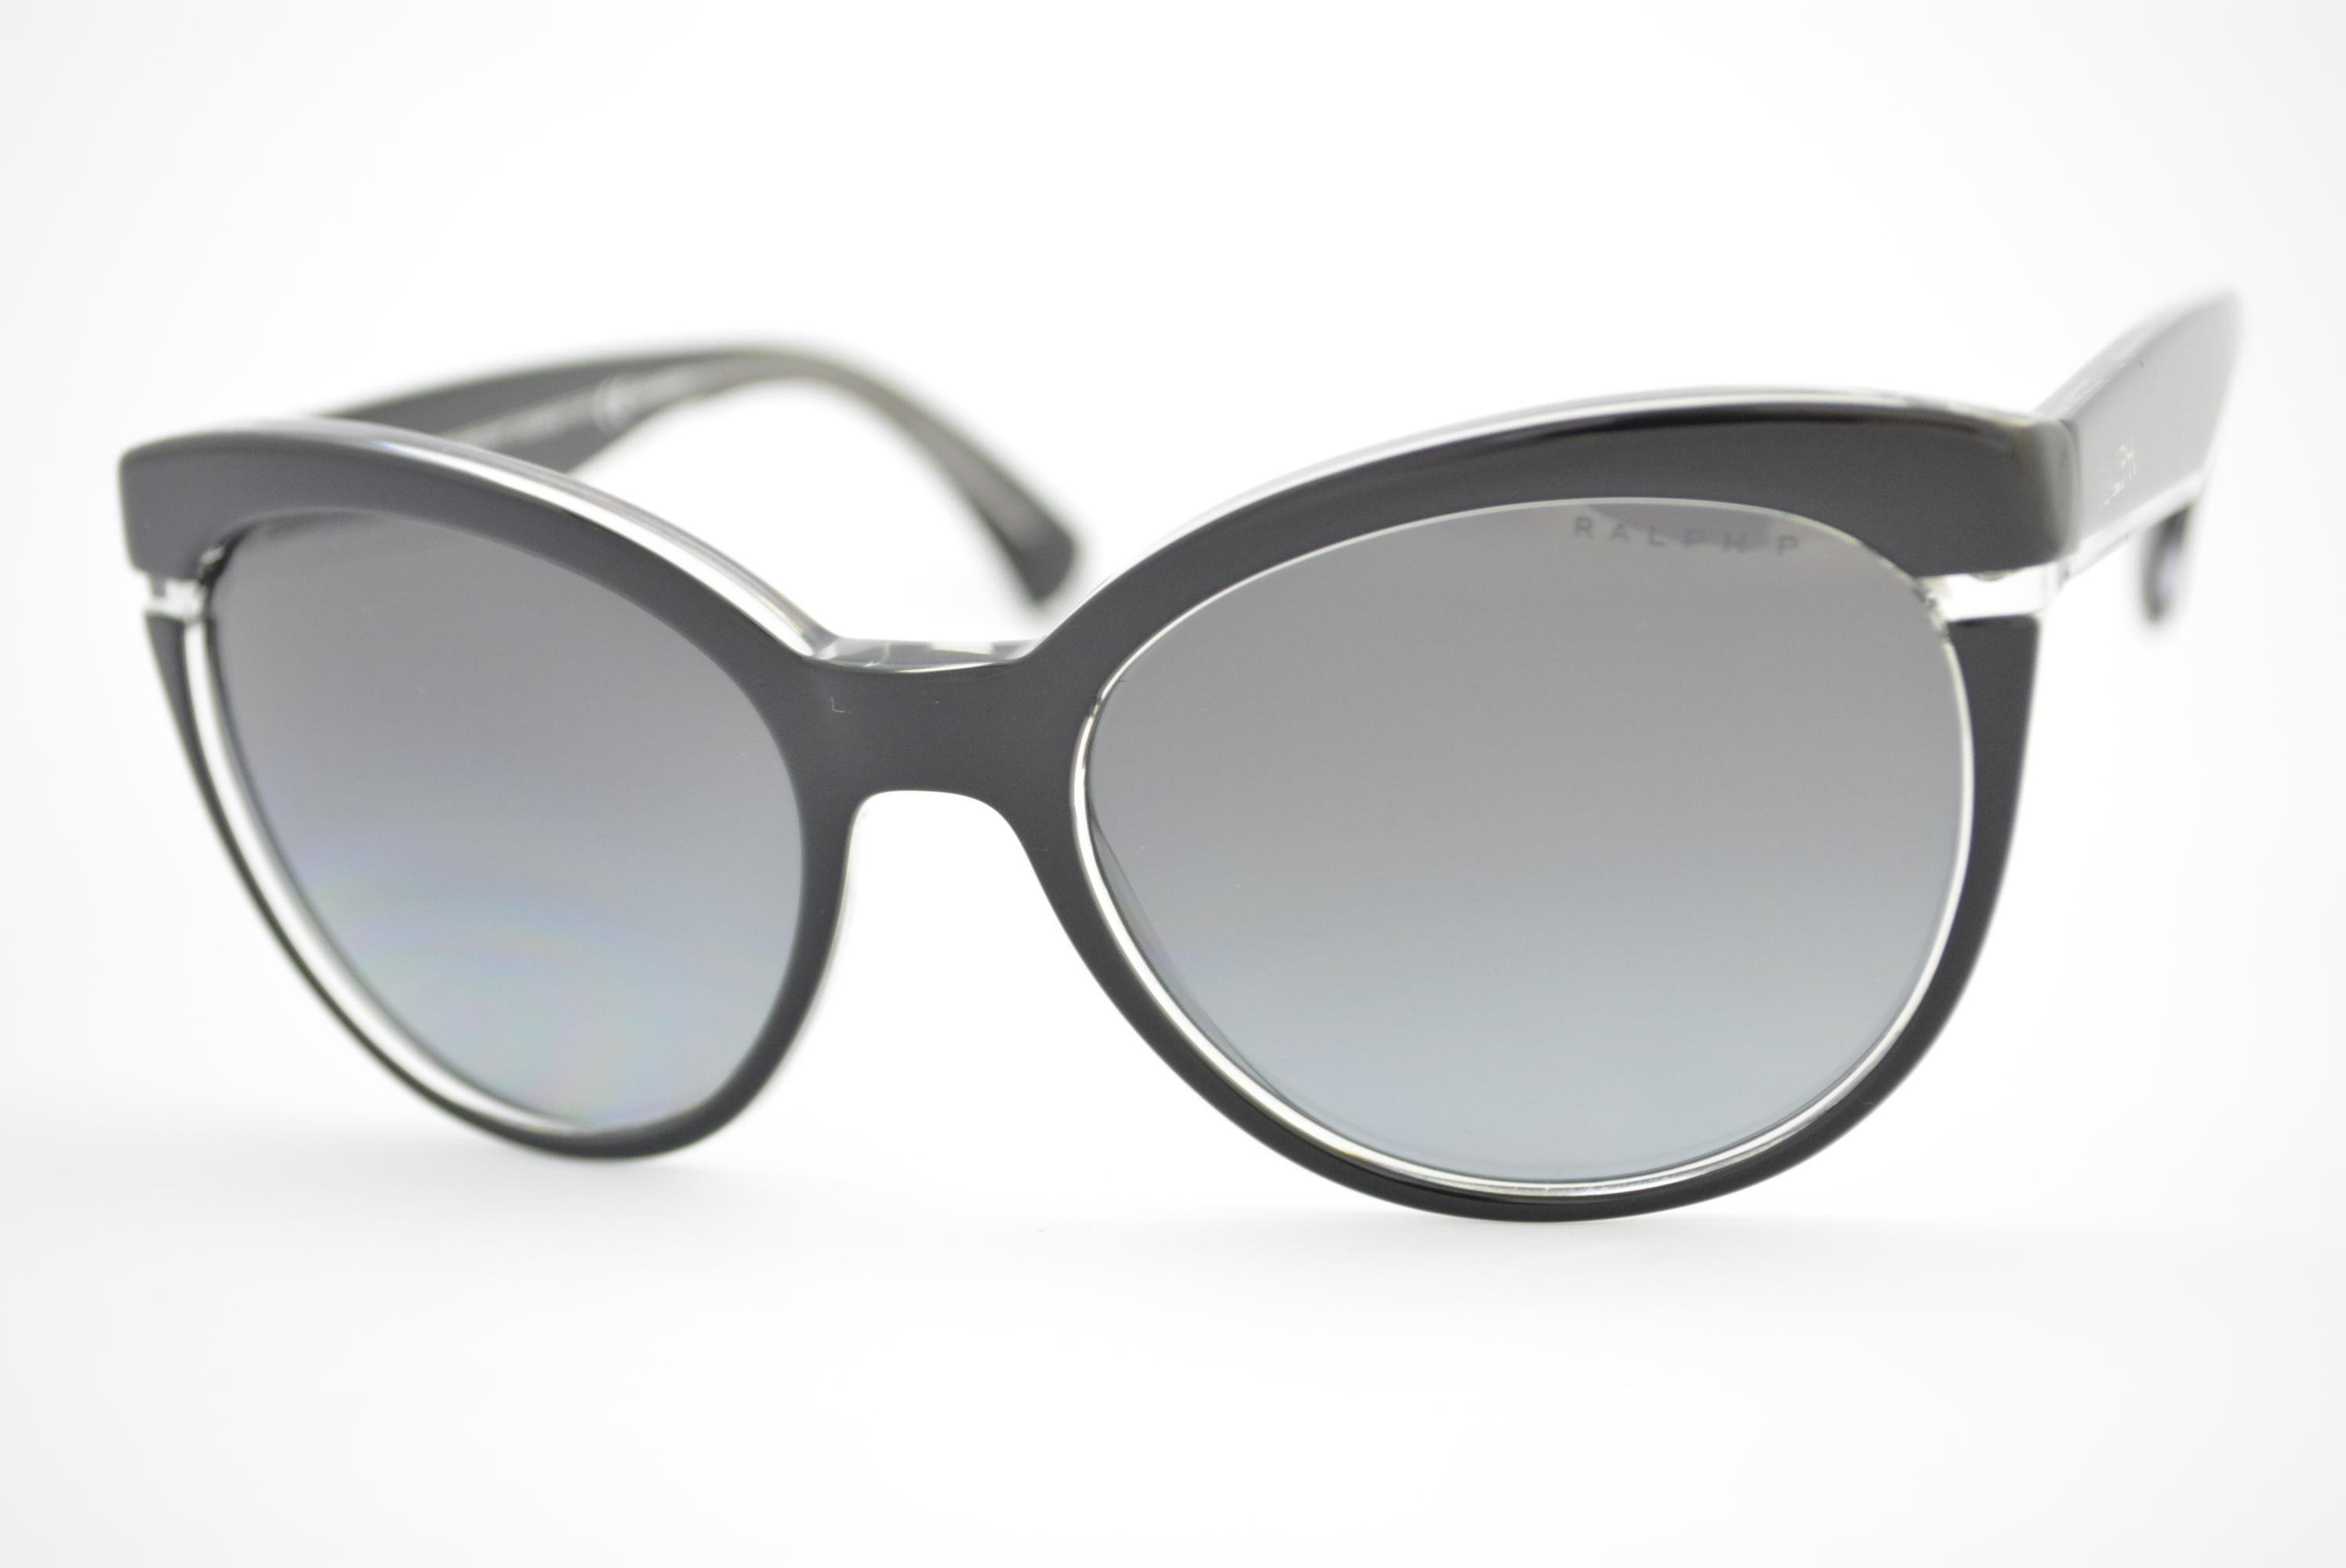 óculos de sol Ralph Lauren mod ra5238 1695 t3 Polarizado Ótica Cardoso 7bca74f878